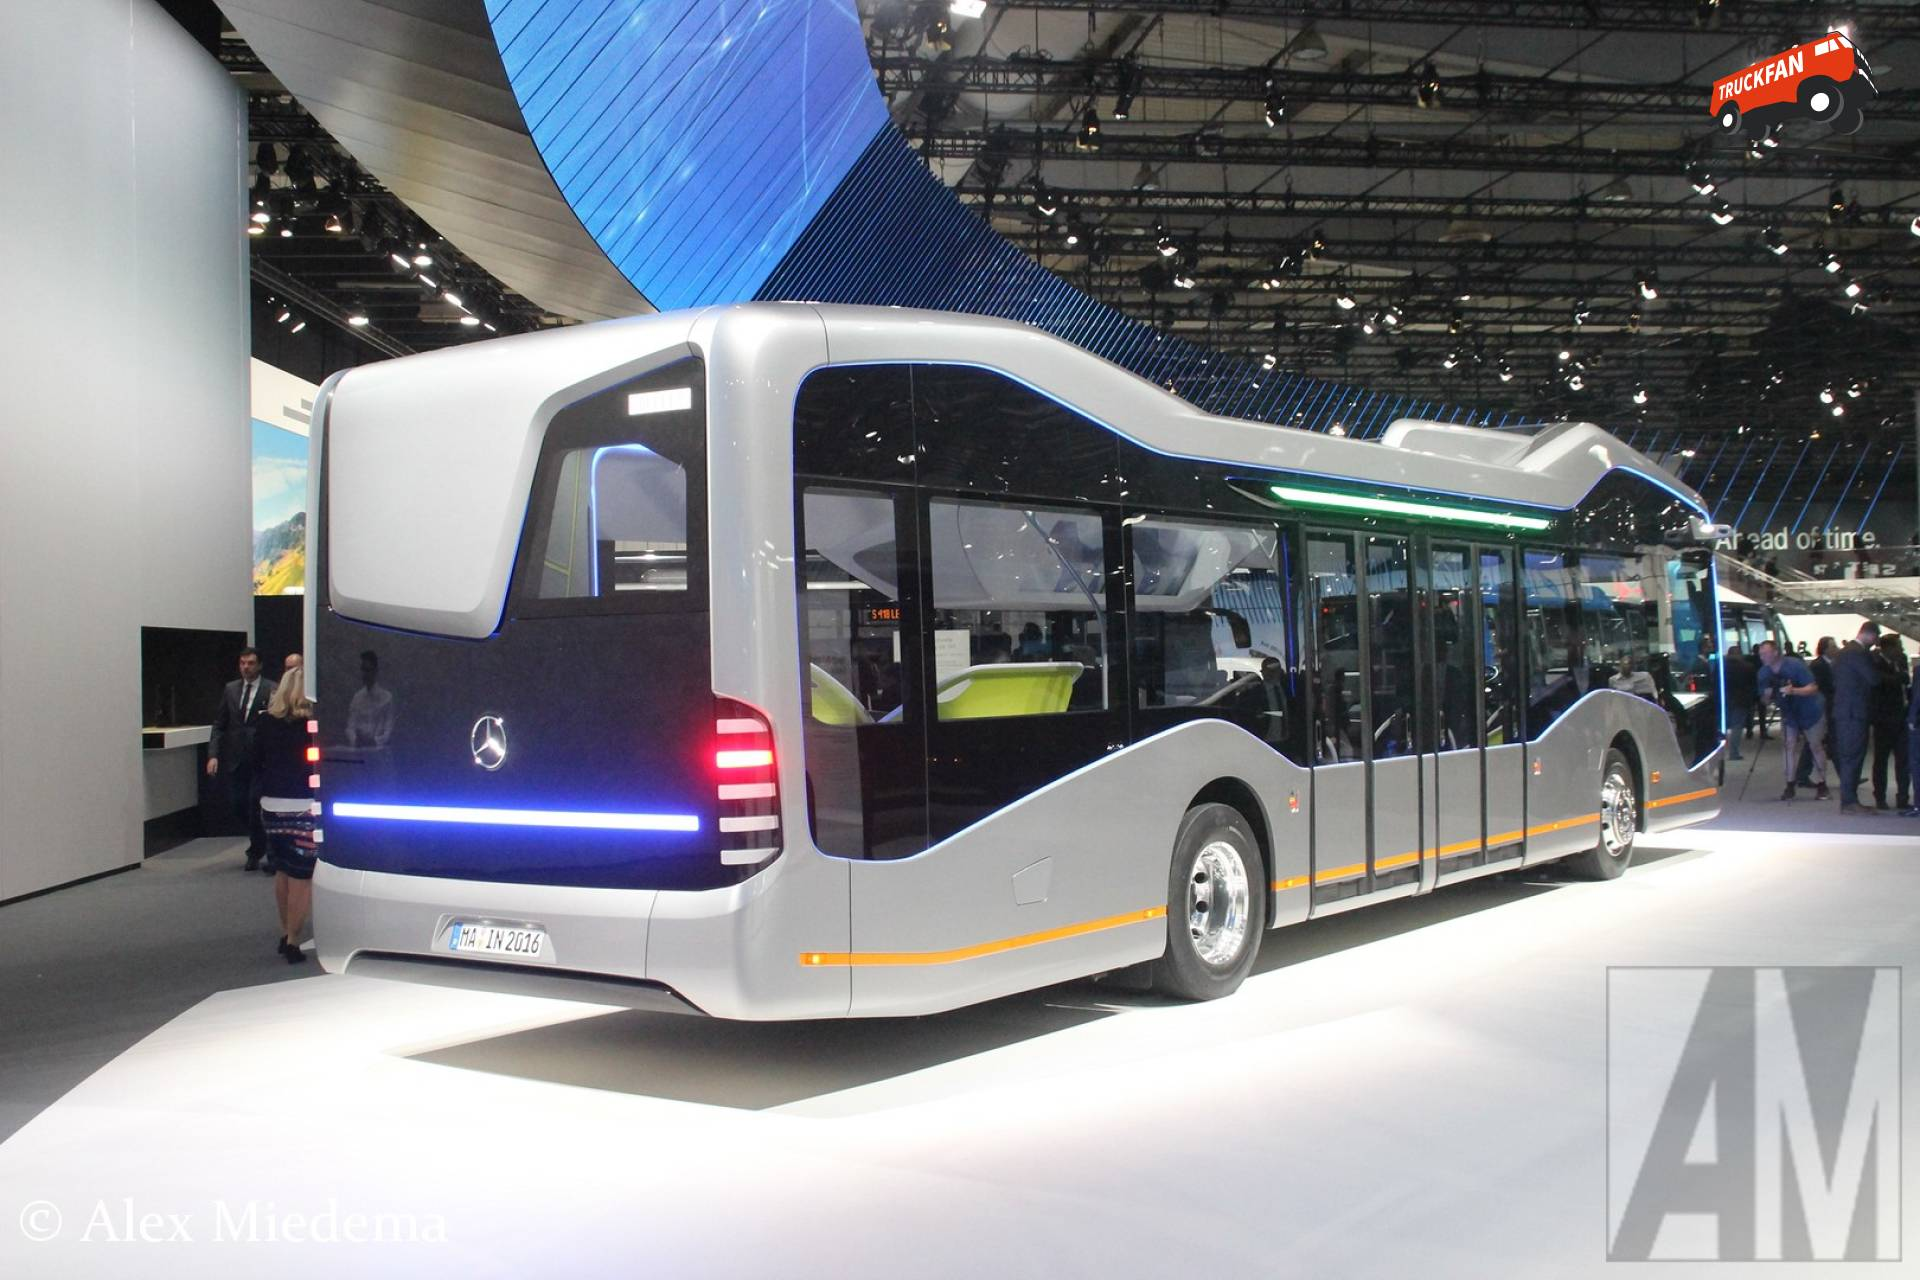 Mercedes benz future bus op de iaa alex miedema for Mercedes benz long beach service department